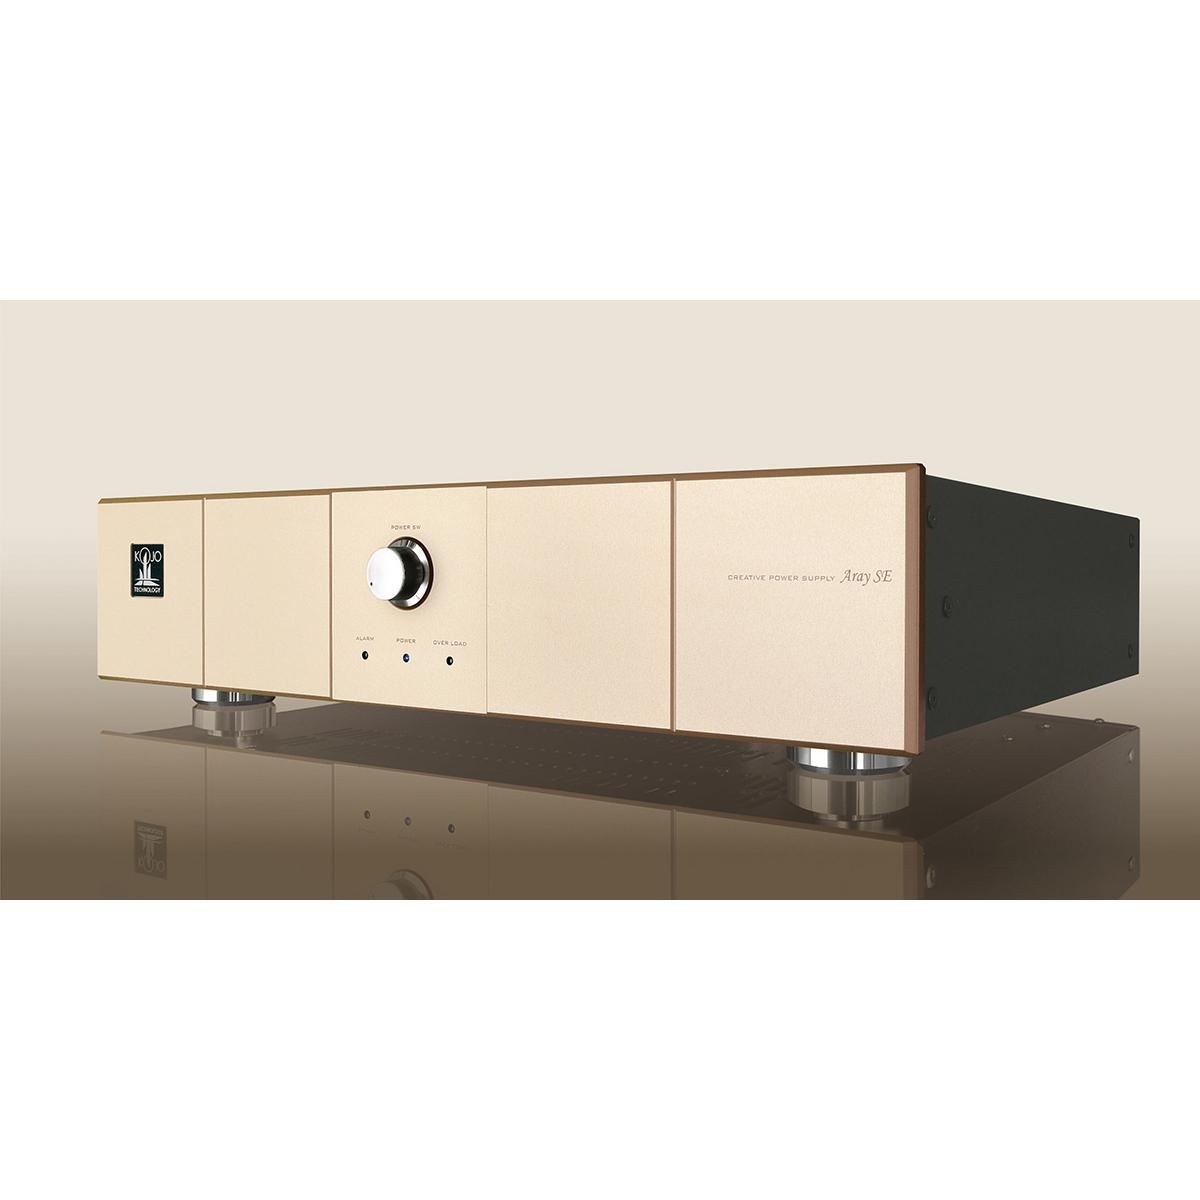 KOJO TECHNOLOGY Aray MKII SE サンセットシャンパンゴールド 入力電圧、出力電圧をご連絡下さい コージョーテクノロジー クリーン電源